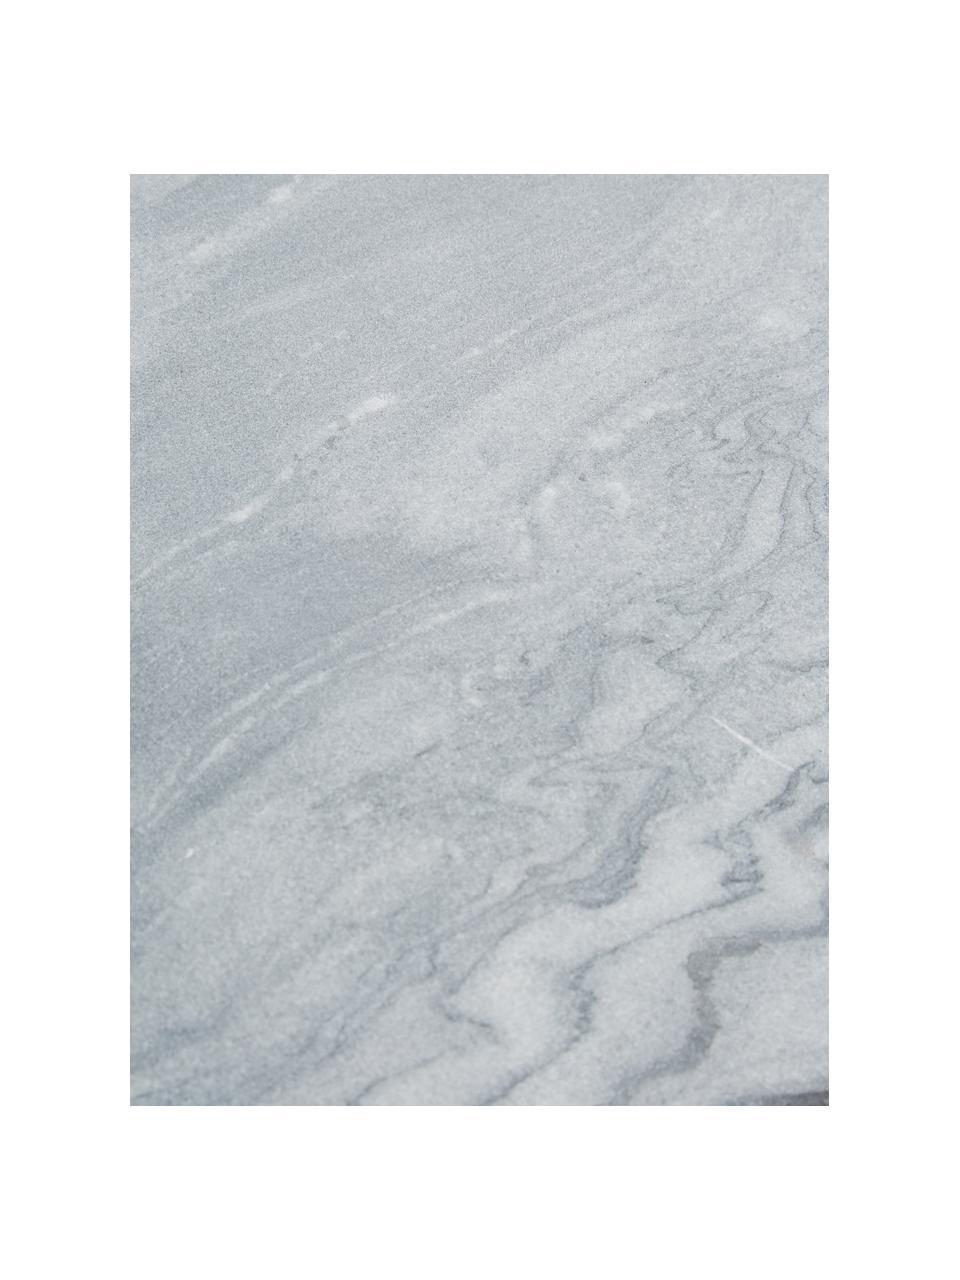 Marmor-Wandregal Porter, Regalboden: Marmor, Schwarzer Marmor, Schwarz, 60 x 24 cm